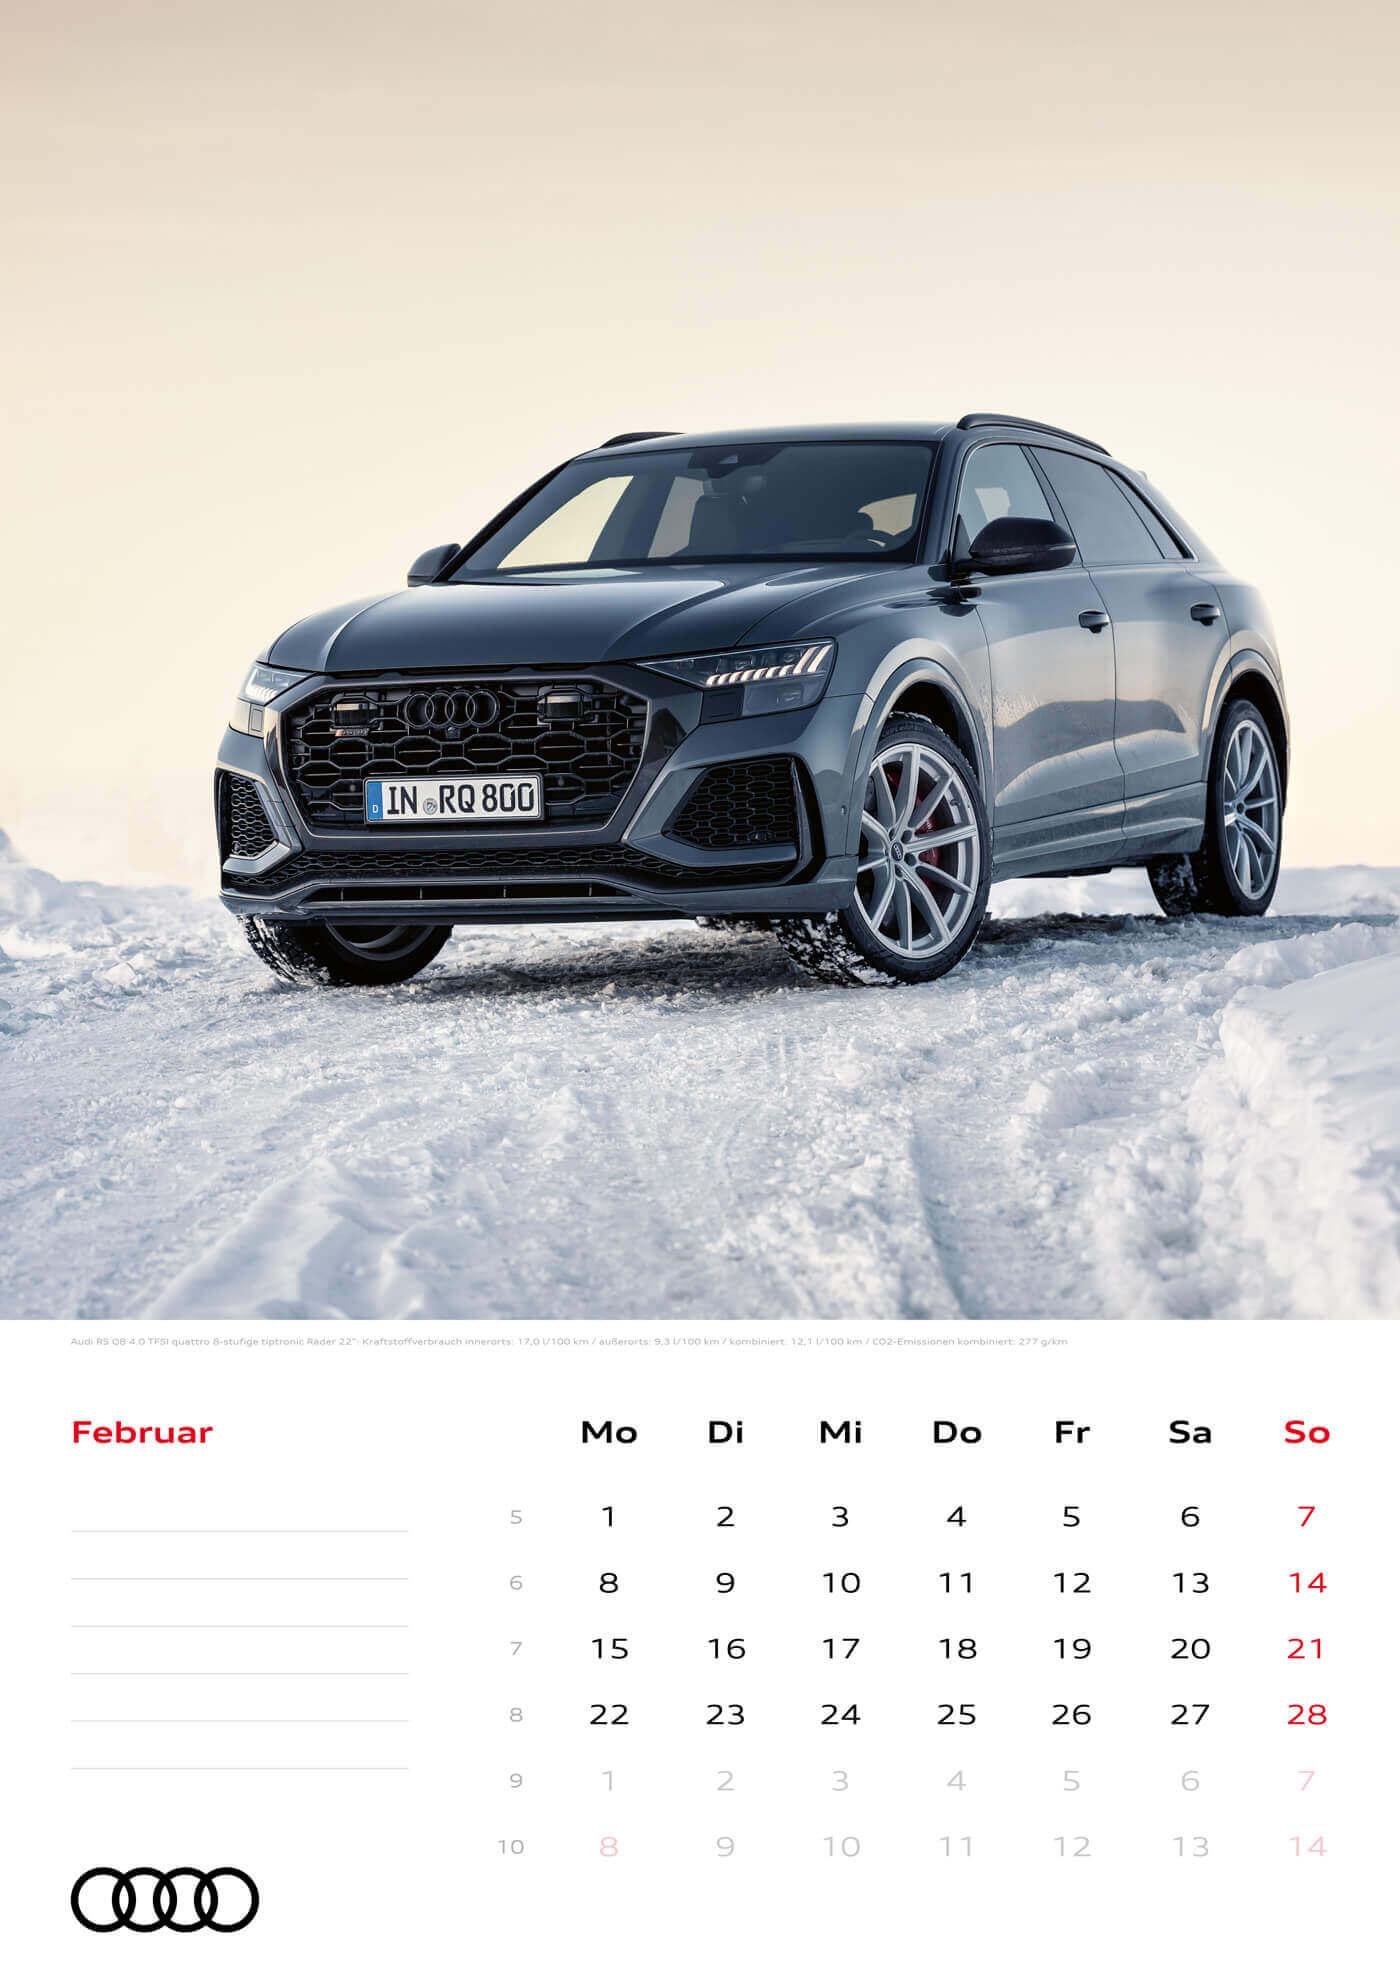 Audi Kalender 2021 - DIN A3 / Audi RSQ8